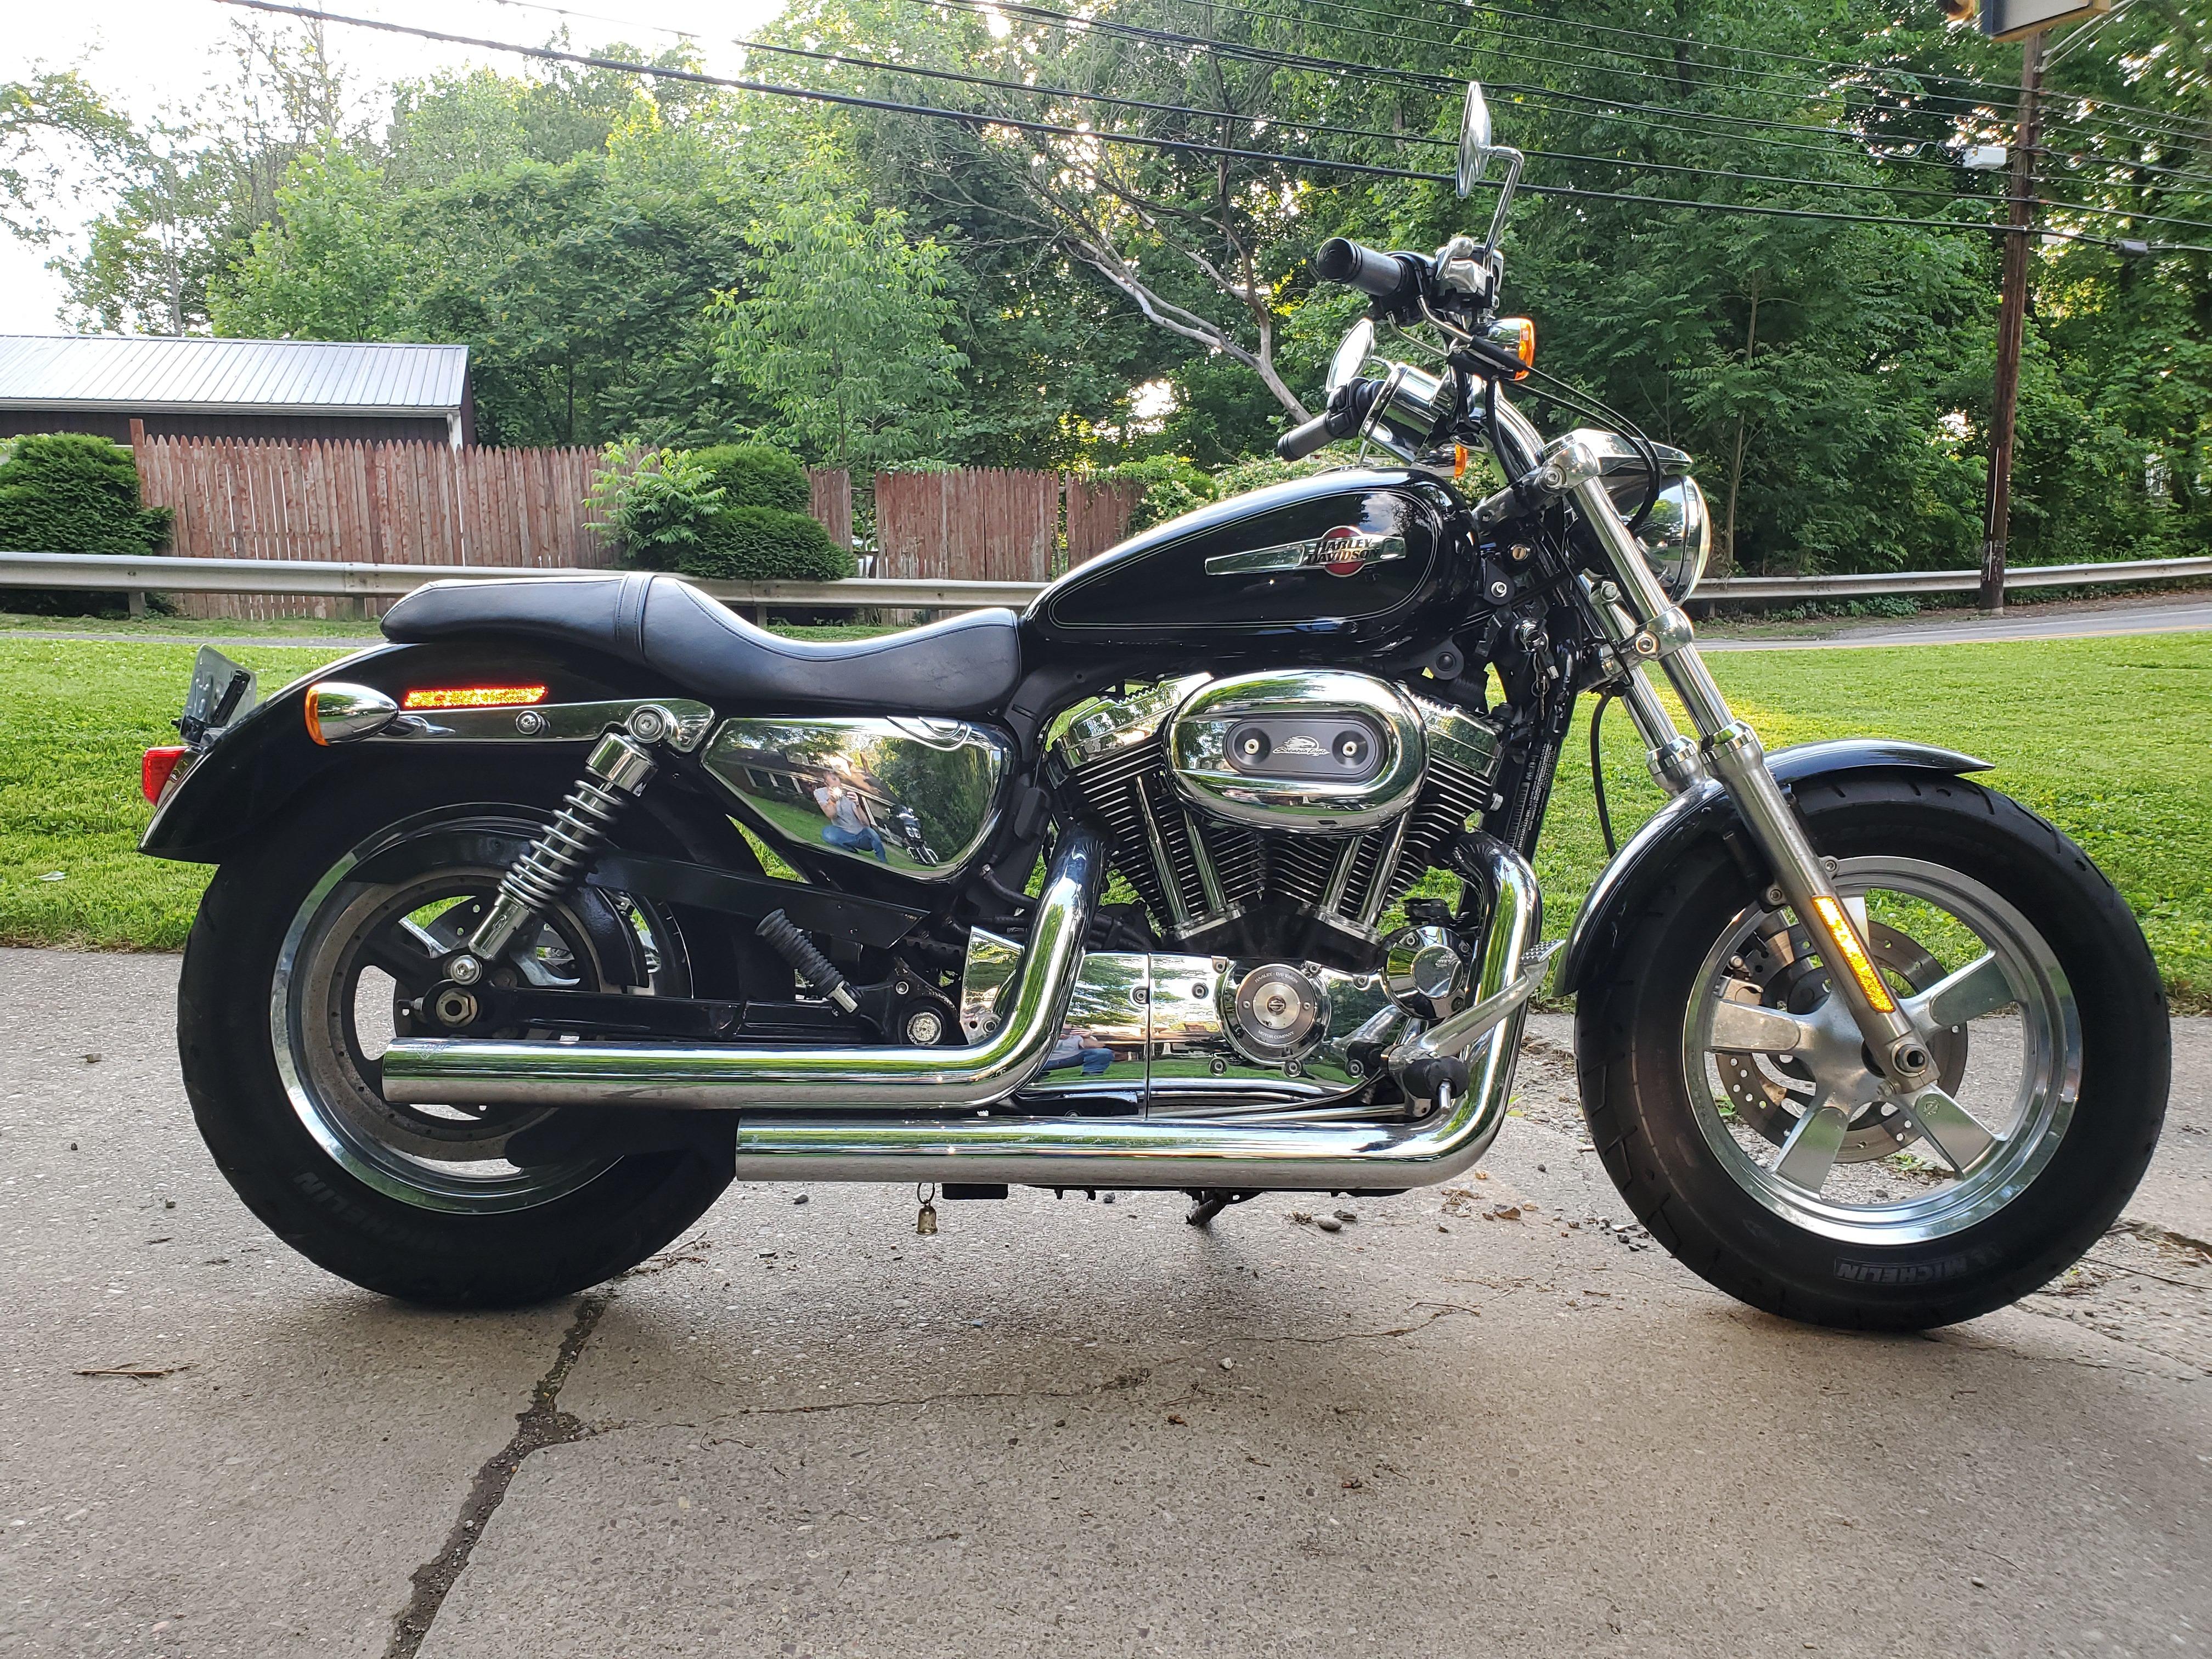 Photo 2012 Harley-Davidson SPORTSTER 1200 CUSTOM $129.03129.03